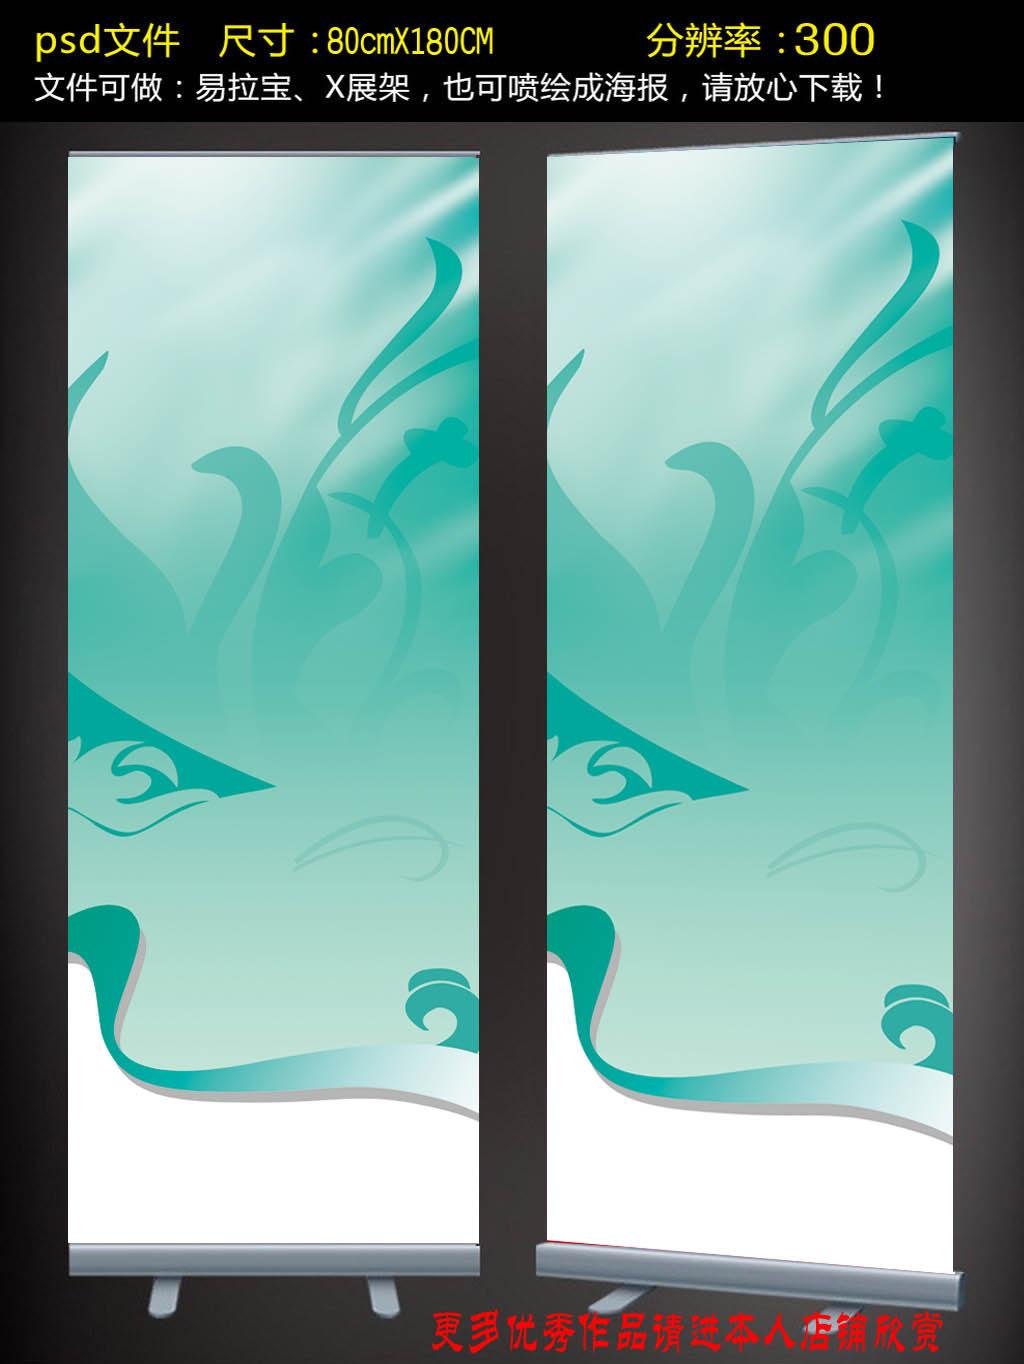 高档x展架背景设计模板